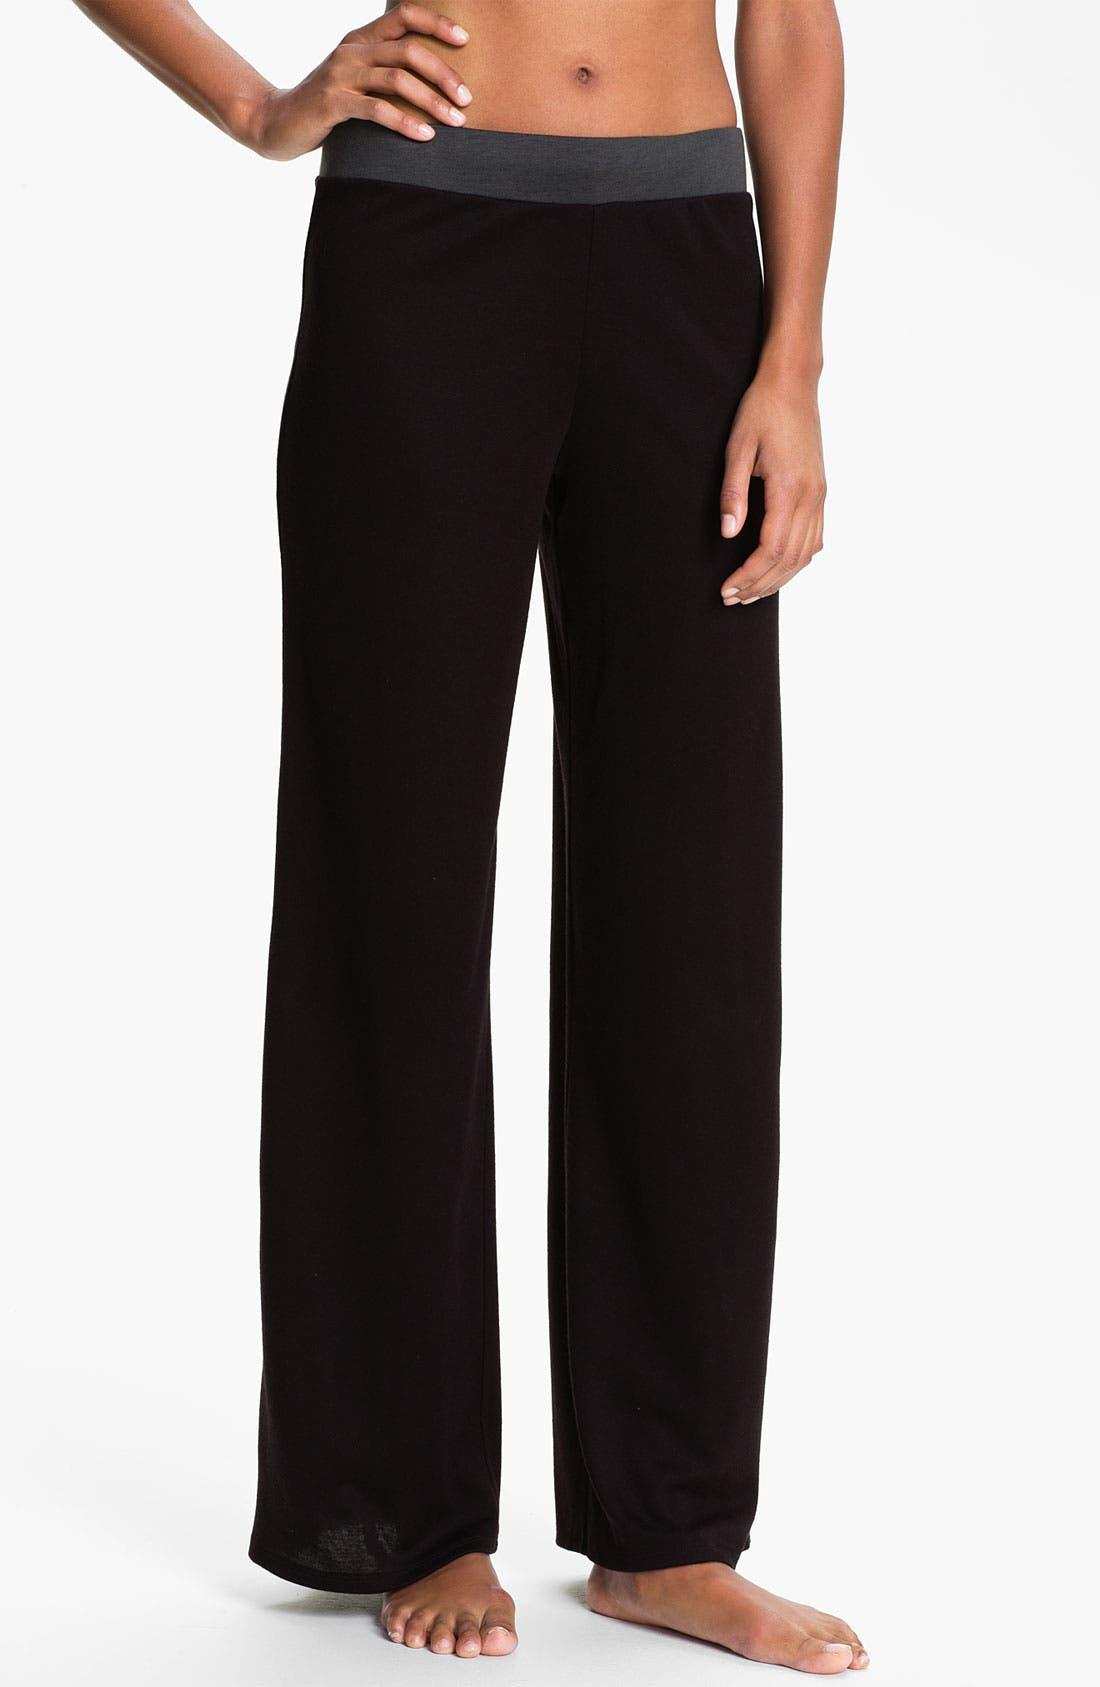 Alternate Image 1 Selected - Natori 'Tuva' Pants